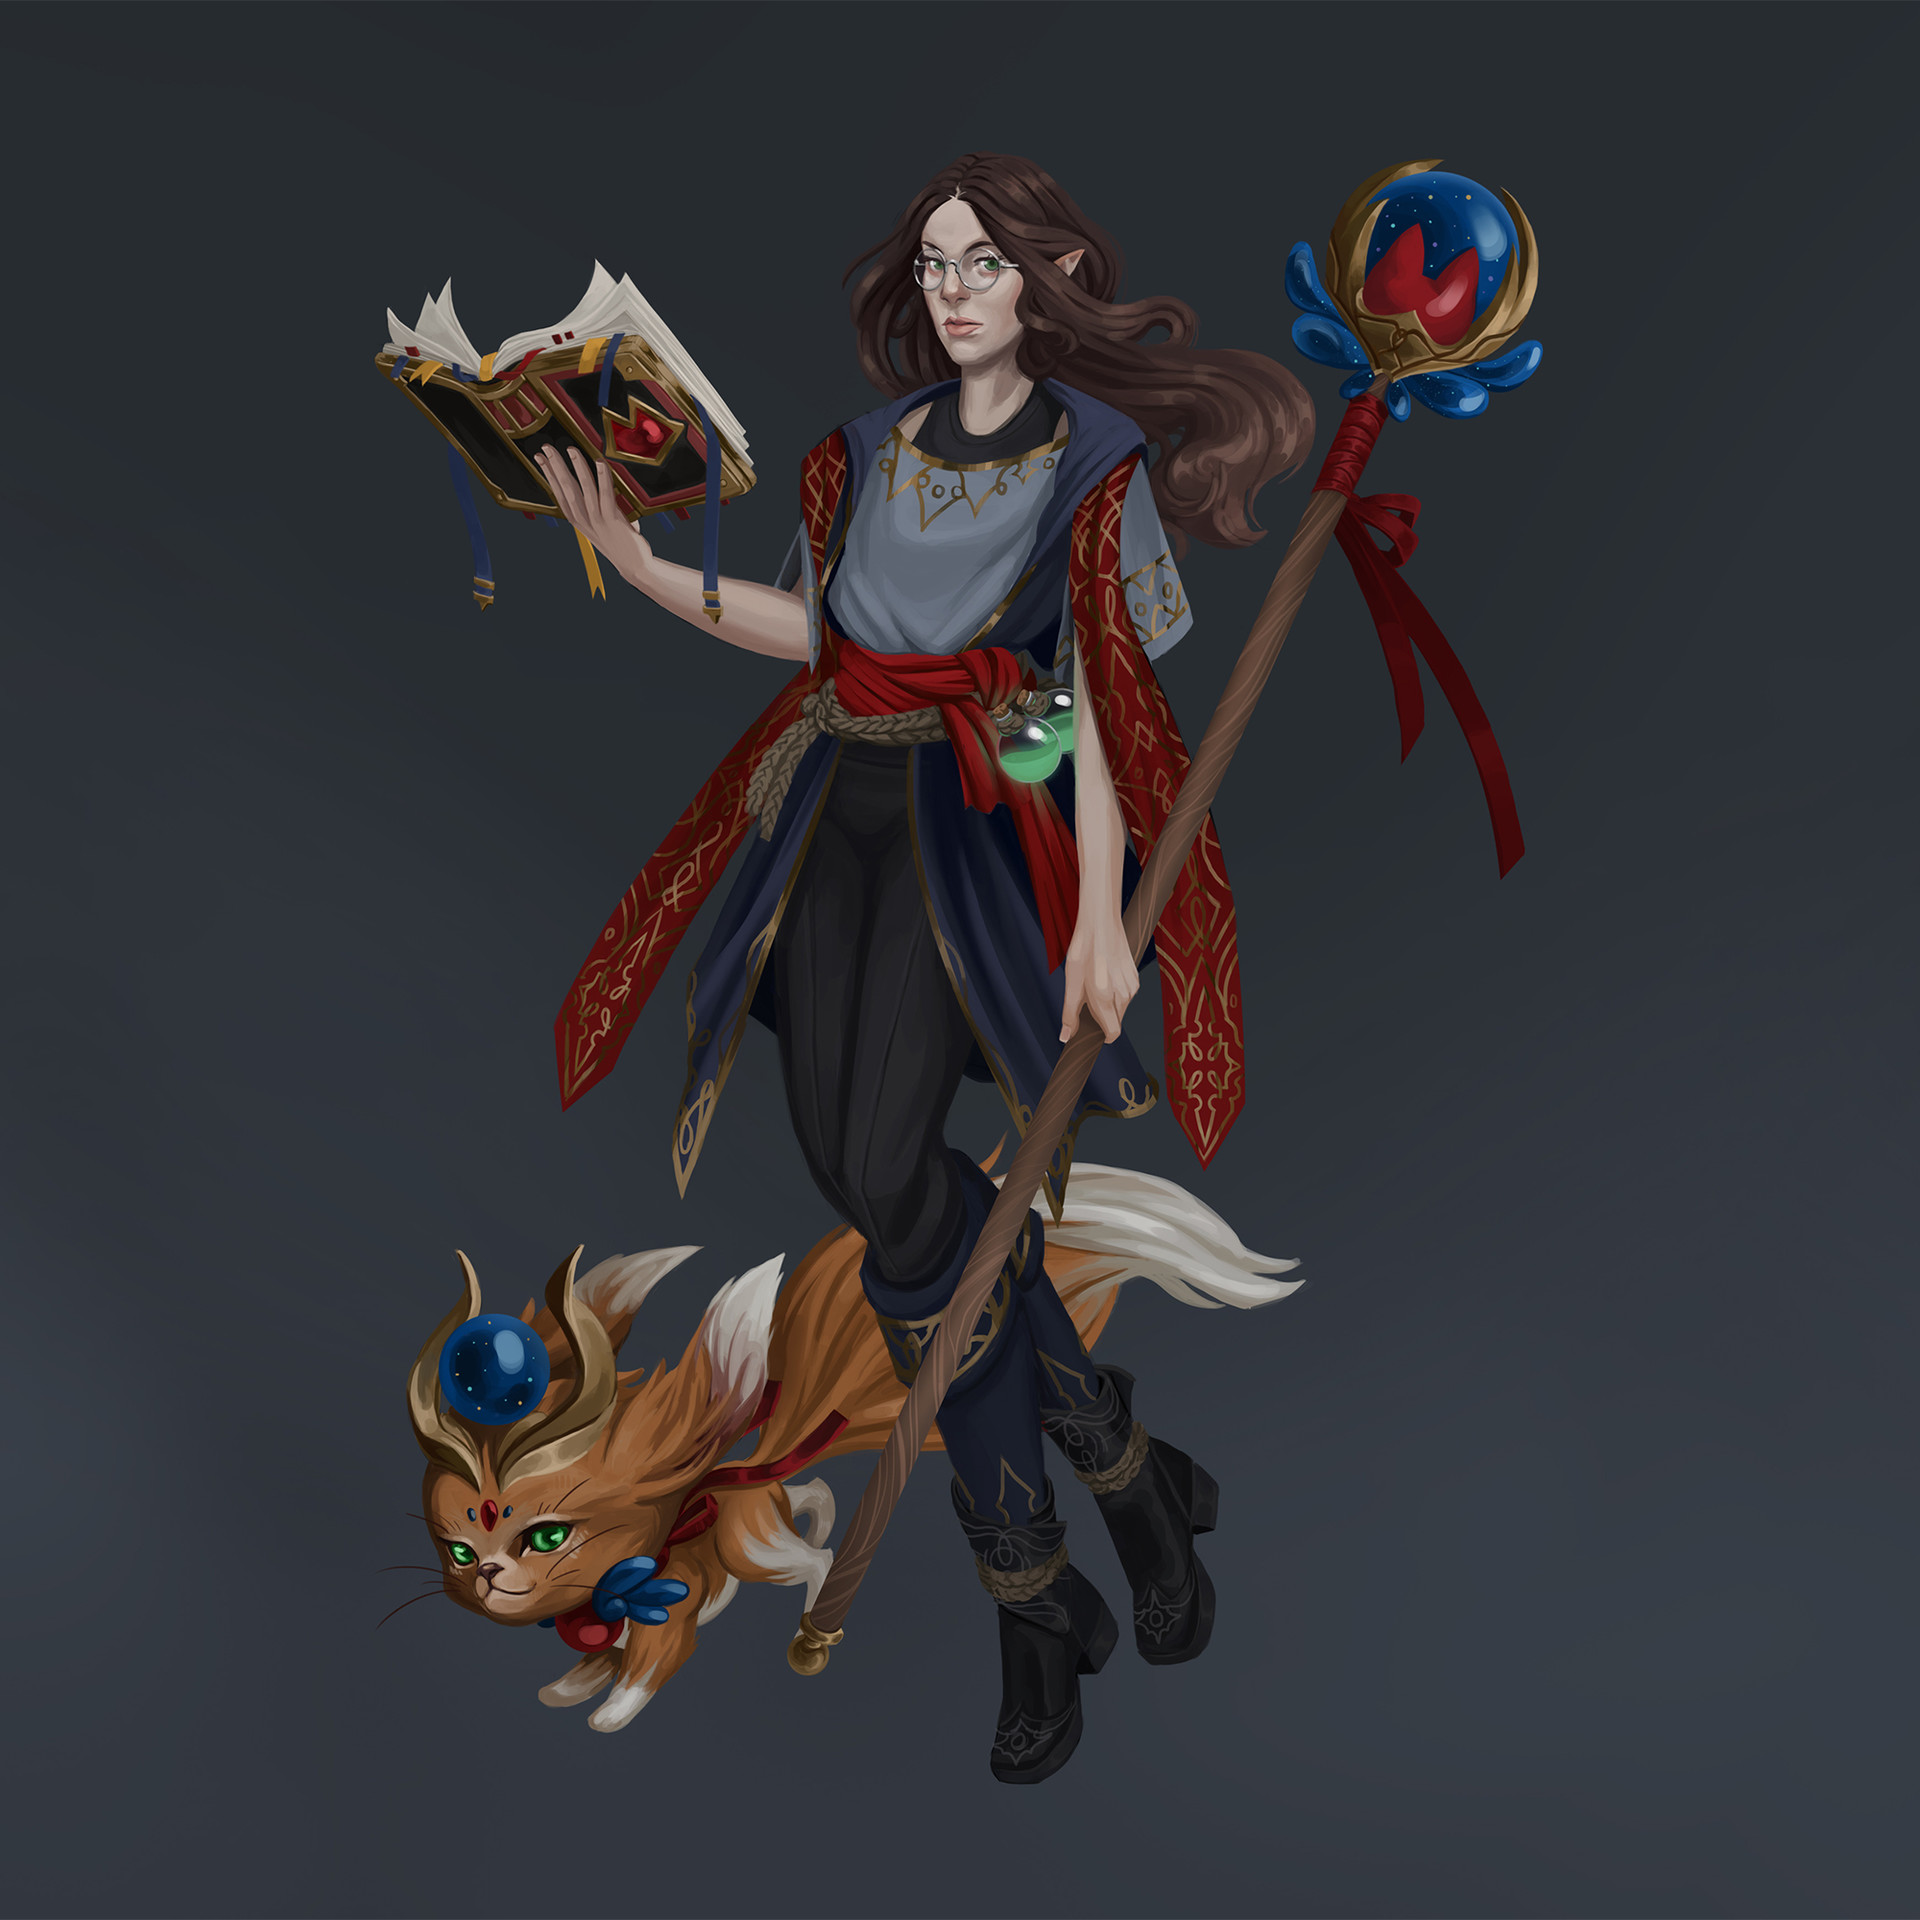 Gabriela marchioro high fantasy character g3